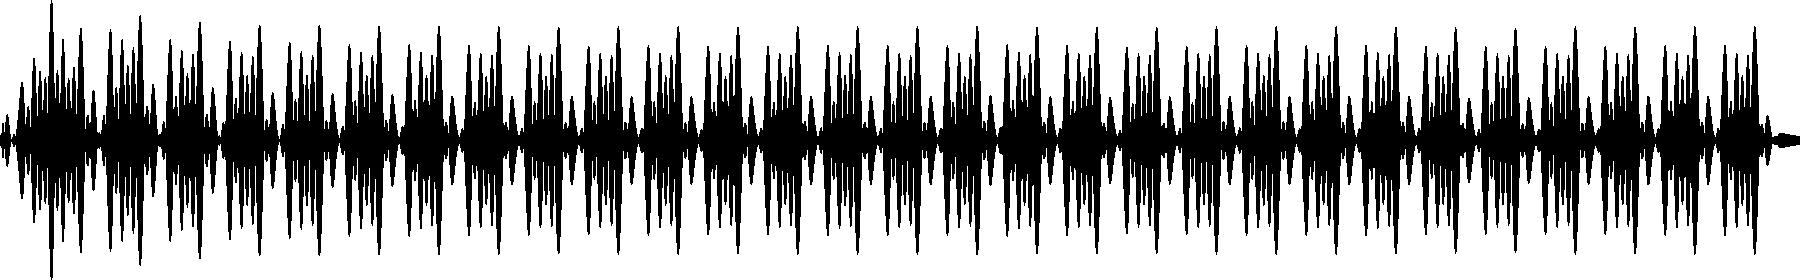 vedh bass cut 086 g